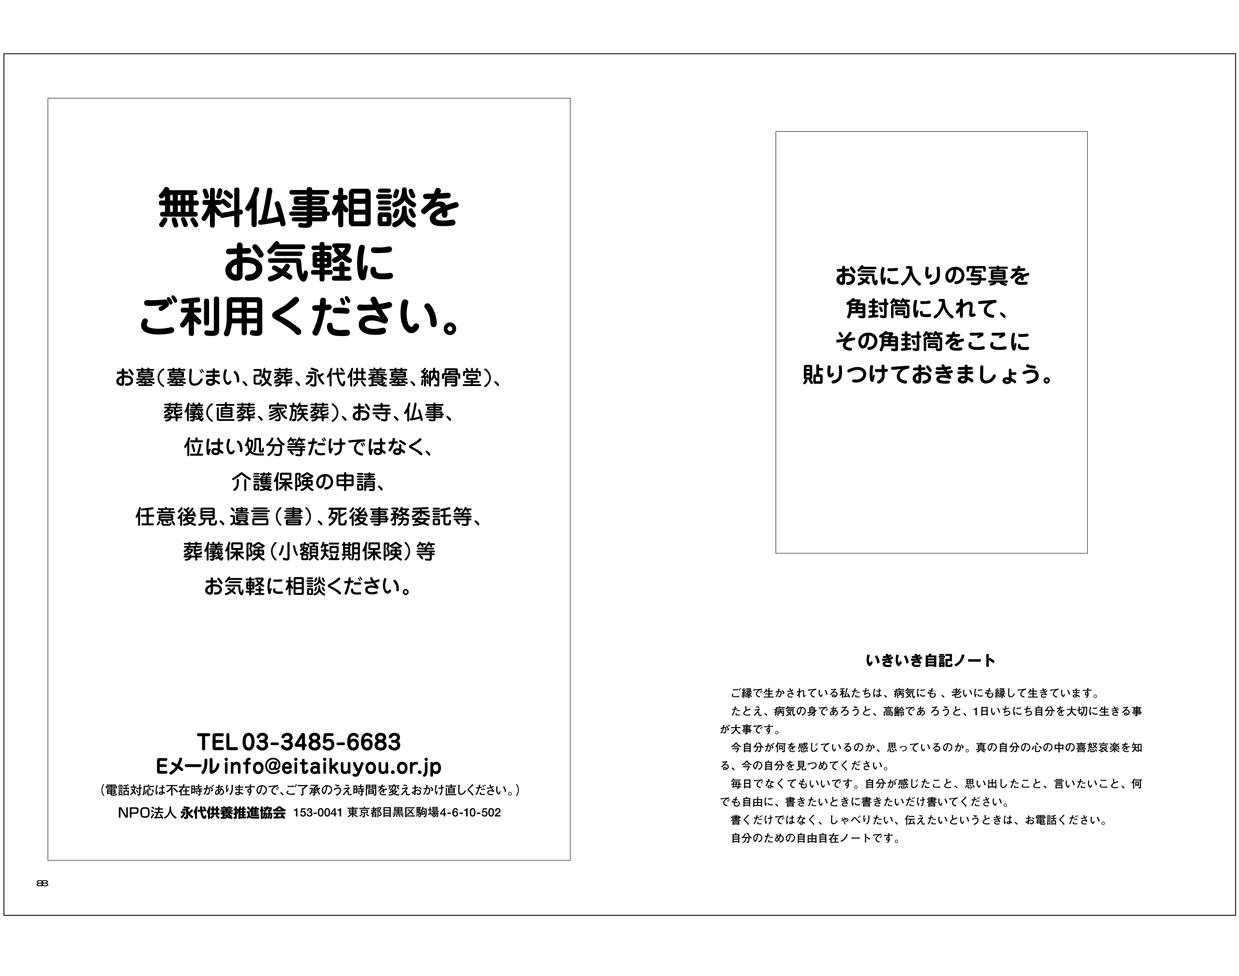 endingnote01_02.jpg